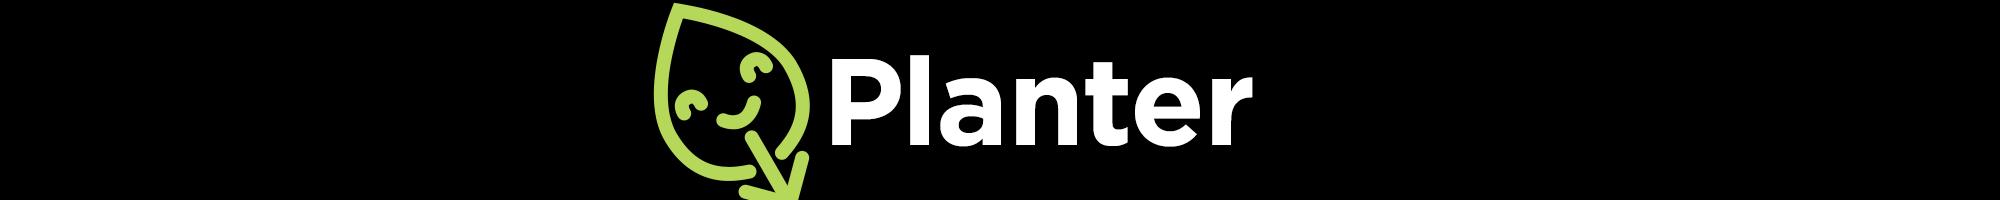 3d_printing_planter-aio-header.png